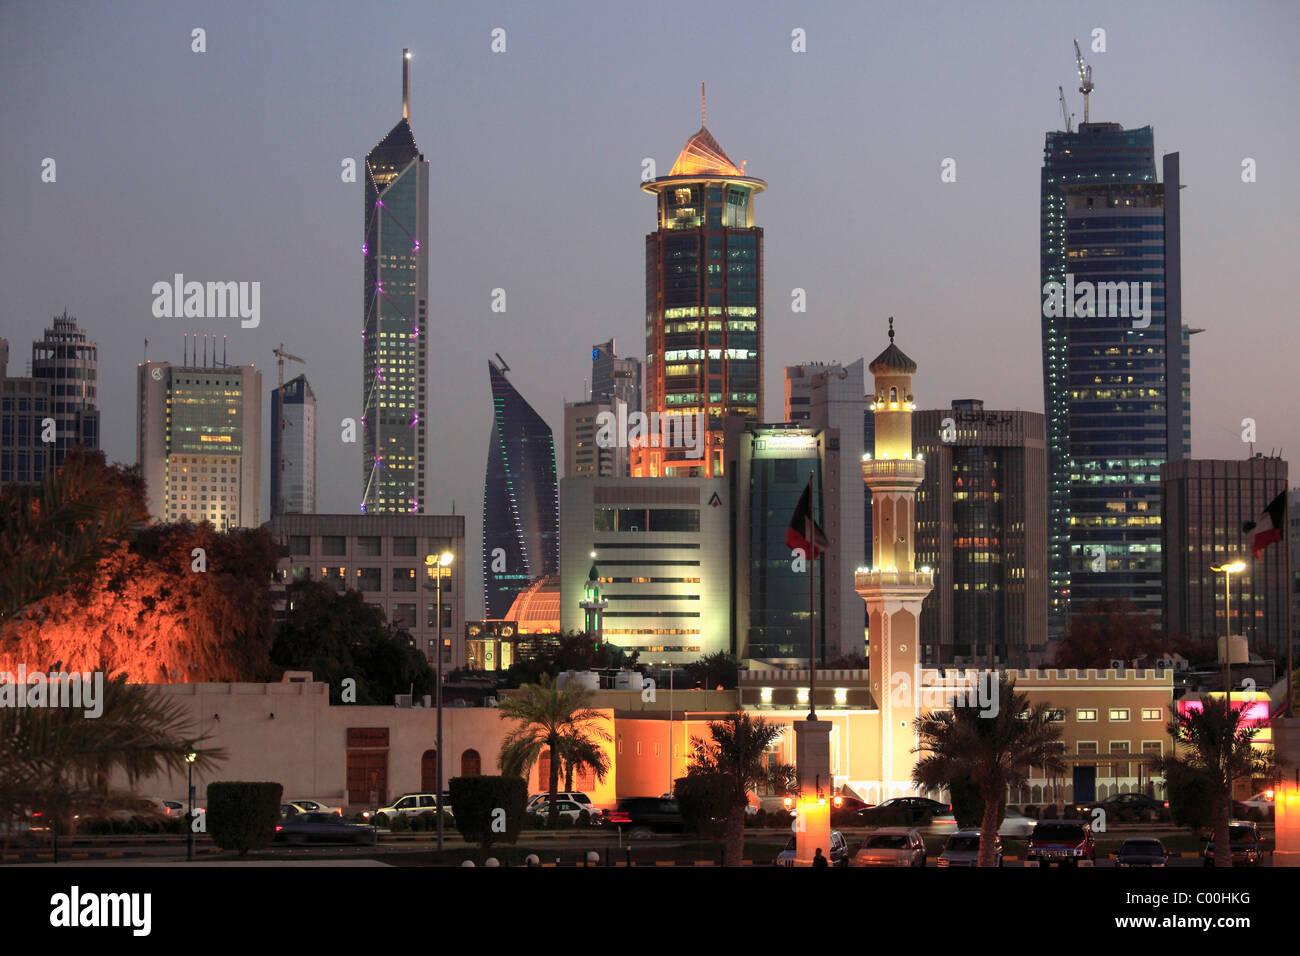 Kuwait, Kuwait City, skyline, skyscrapers, - Stock Image